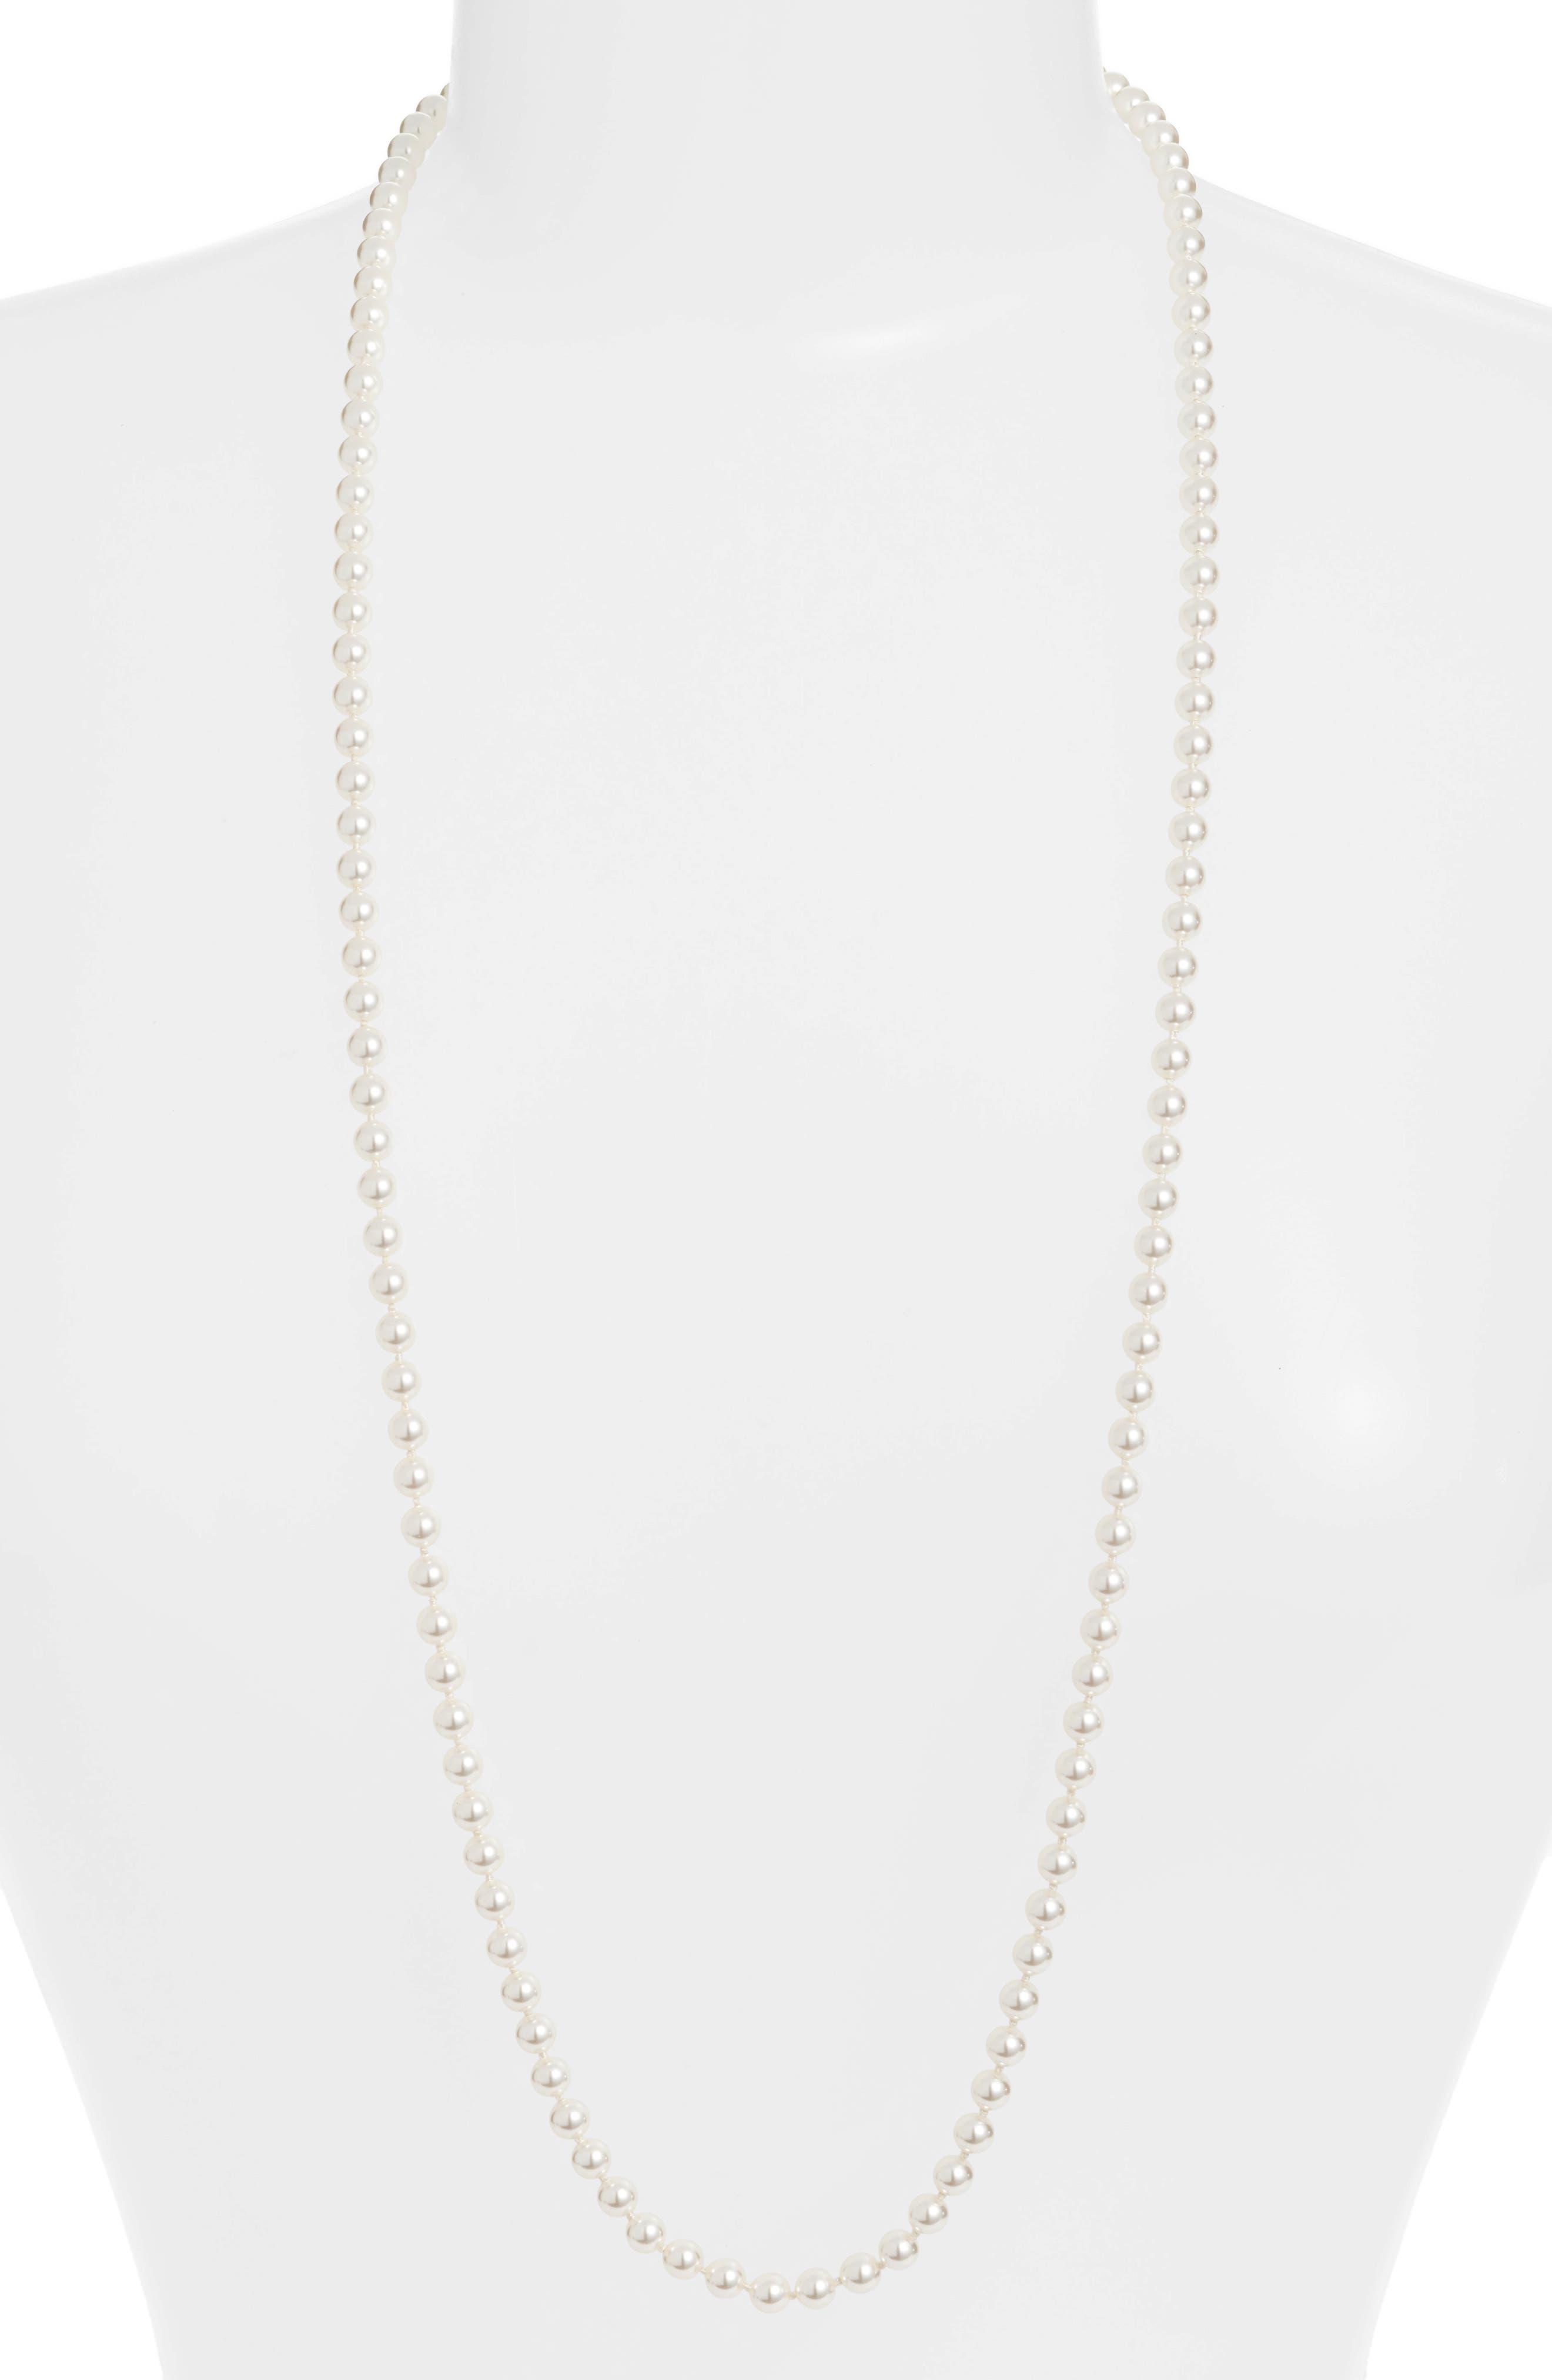 NADRI Long Strand Pearl Necklace in Gray